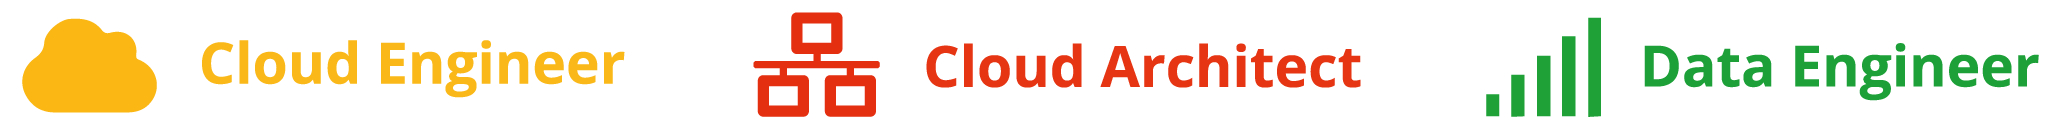 GoogleCloud_certification icons_cloud_horizontal_0120_cmyk_uncoated copia